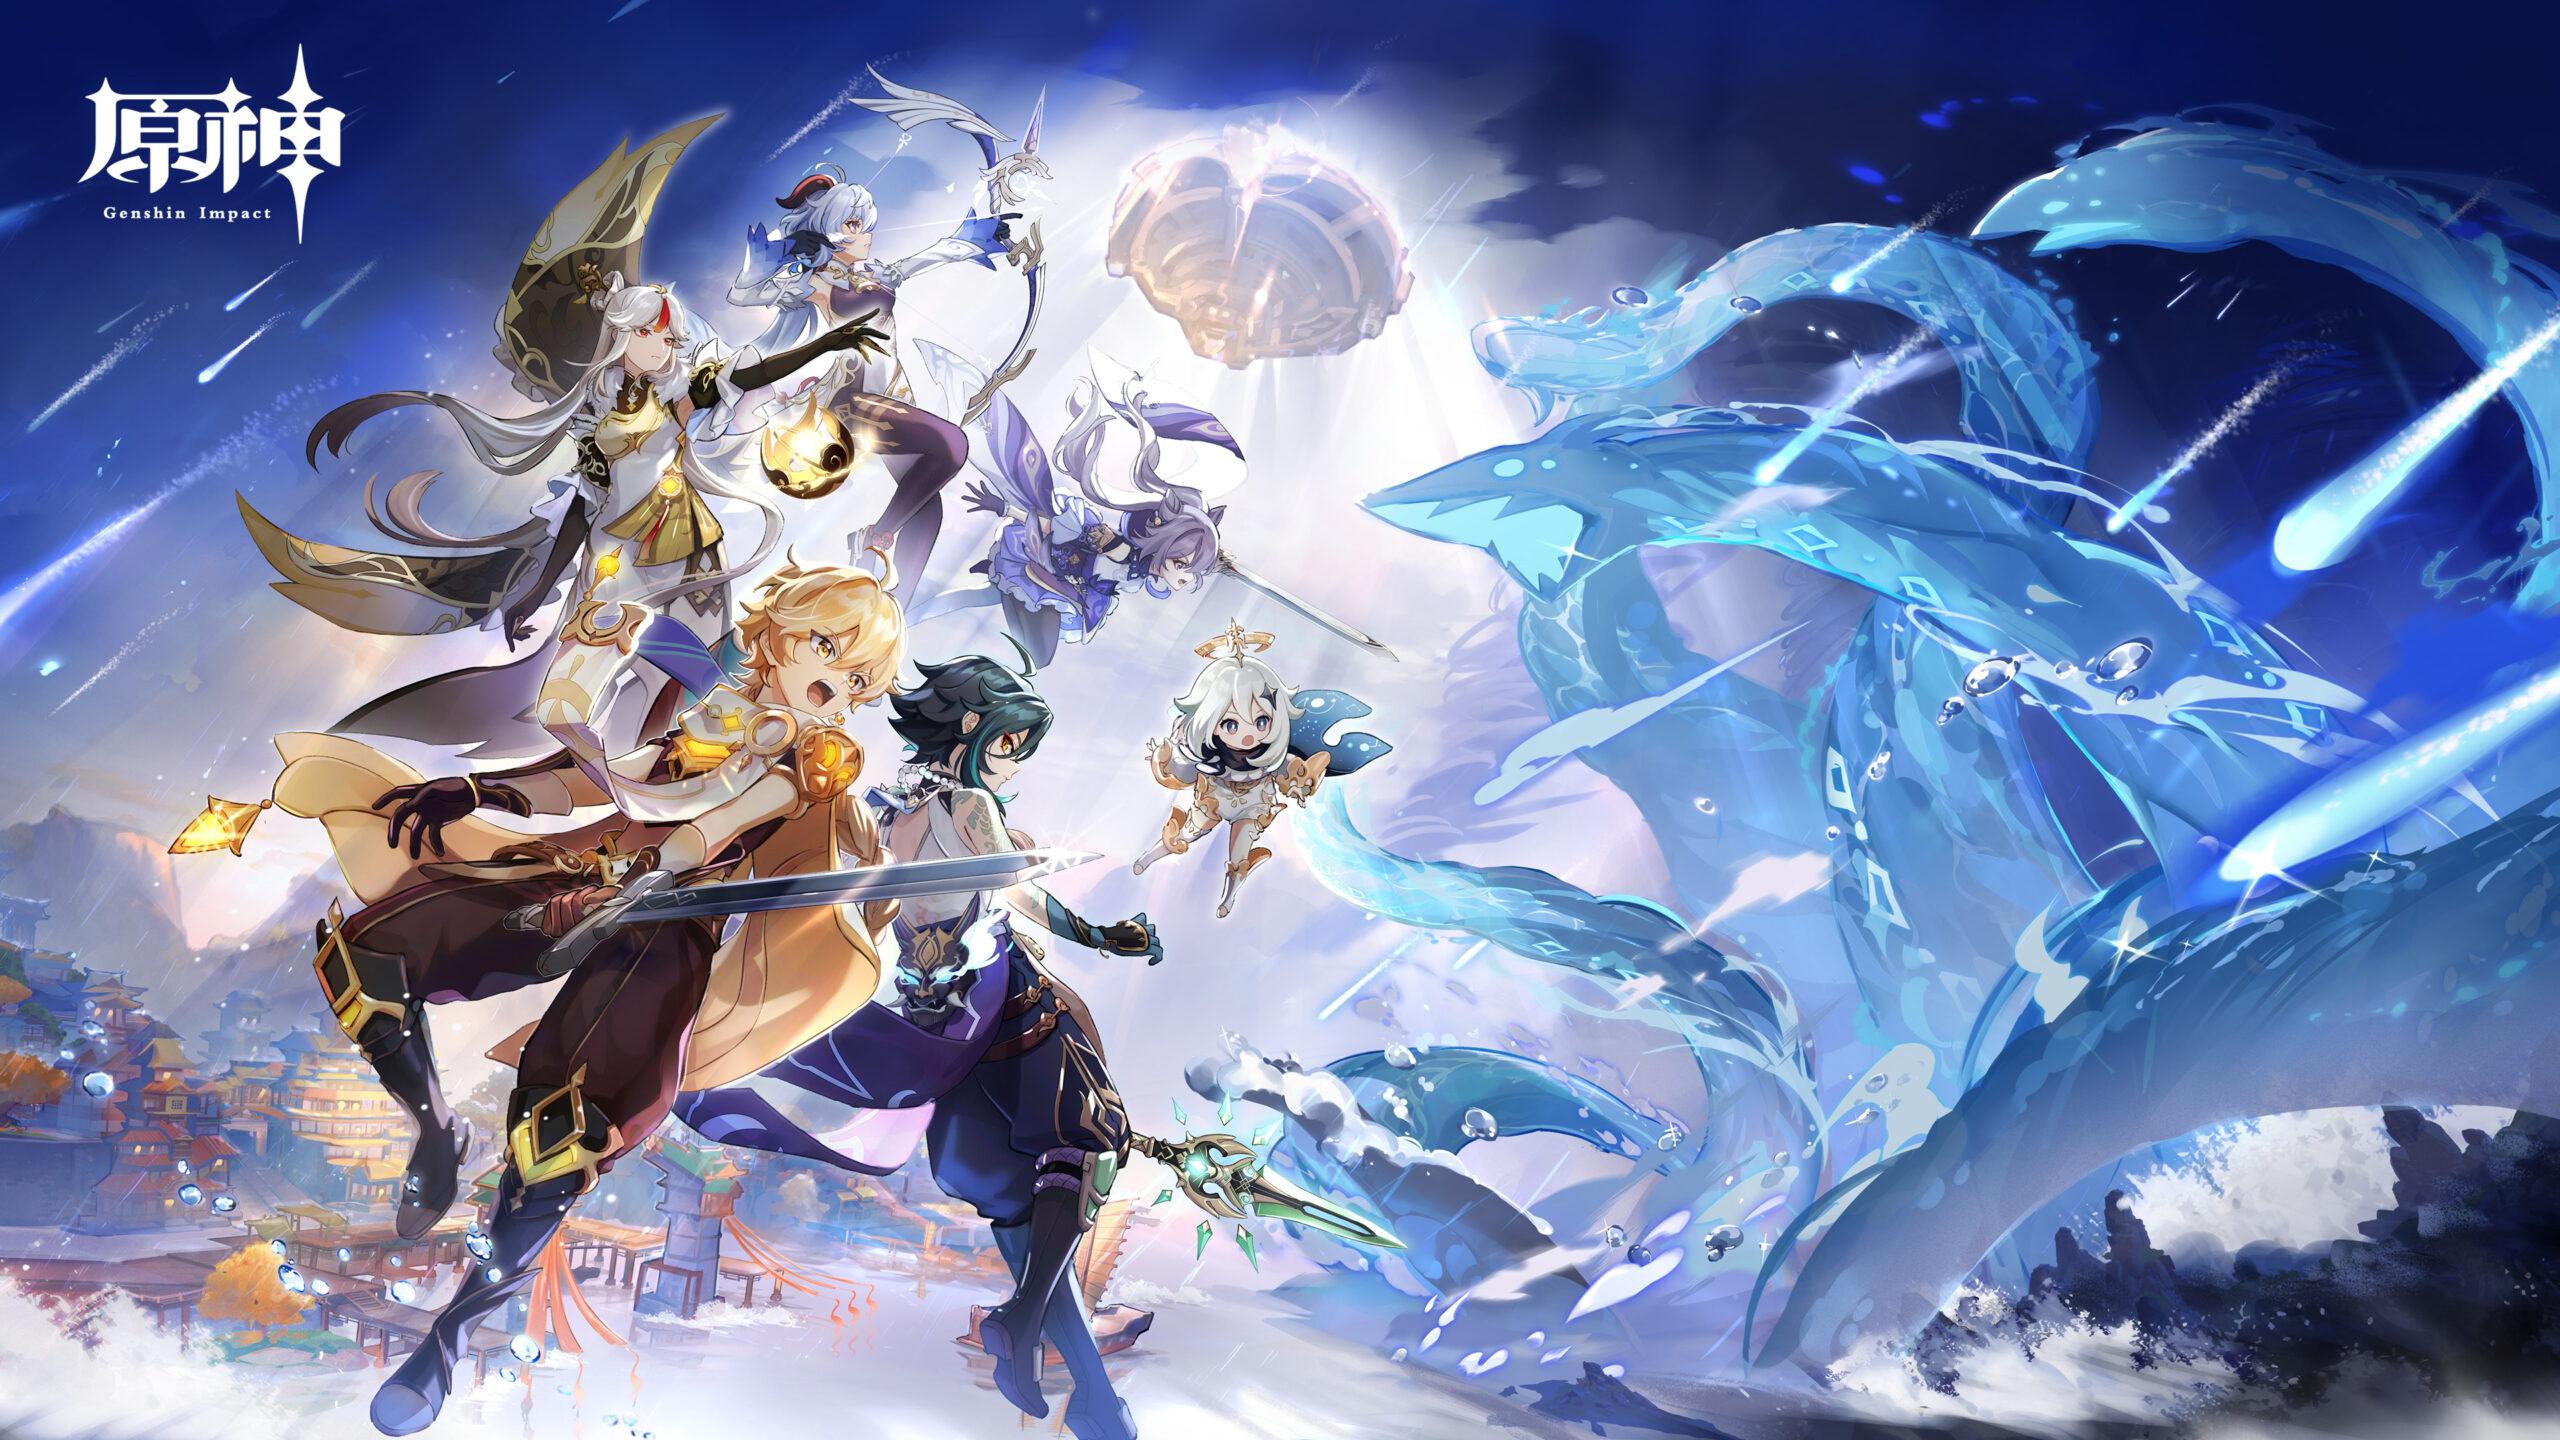 Genshin Impact PS5 Update